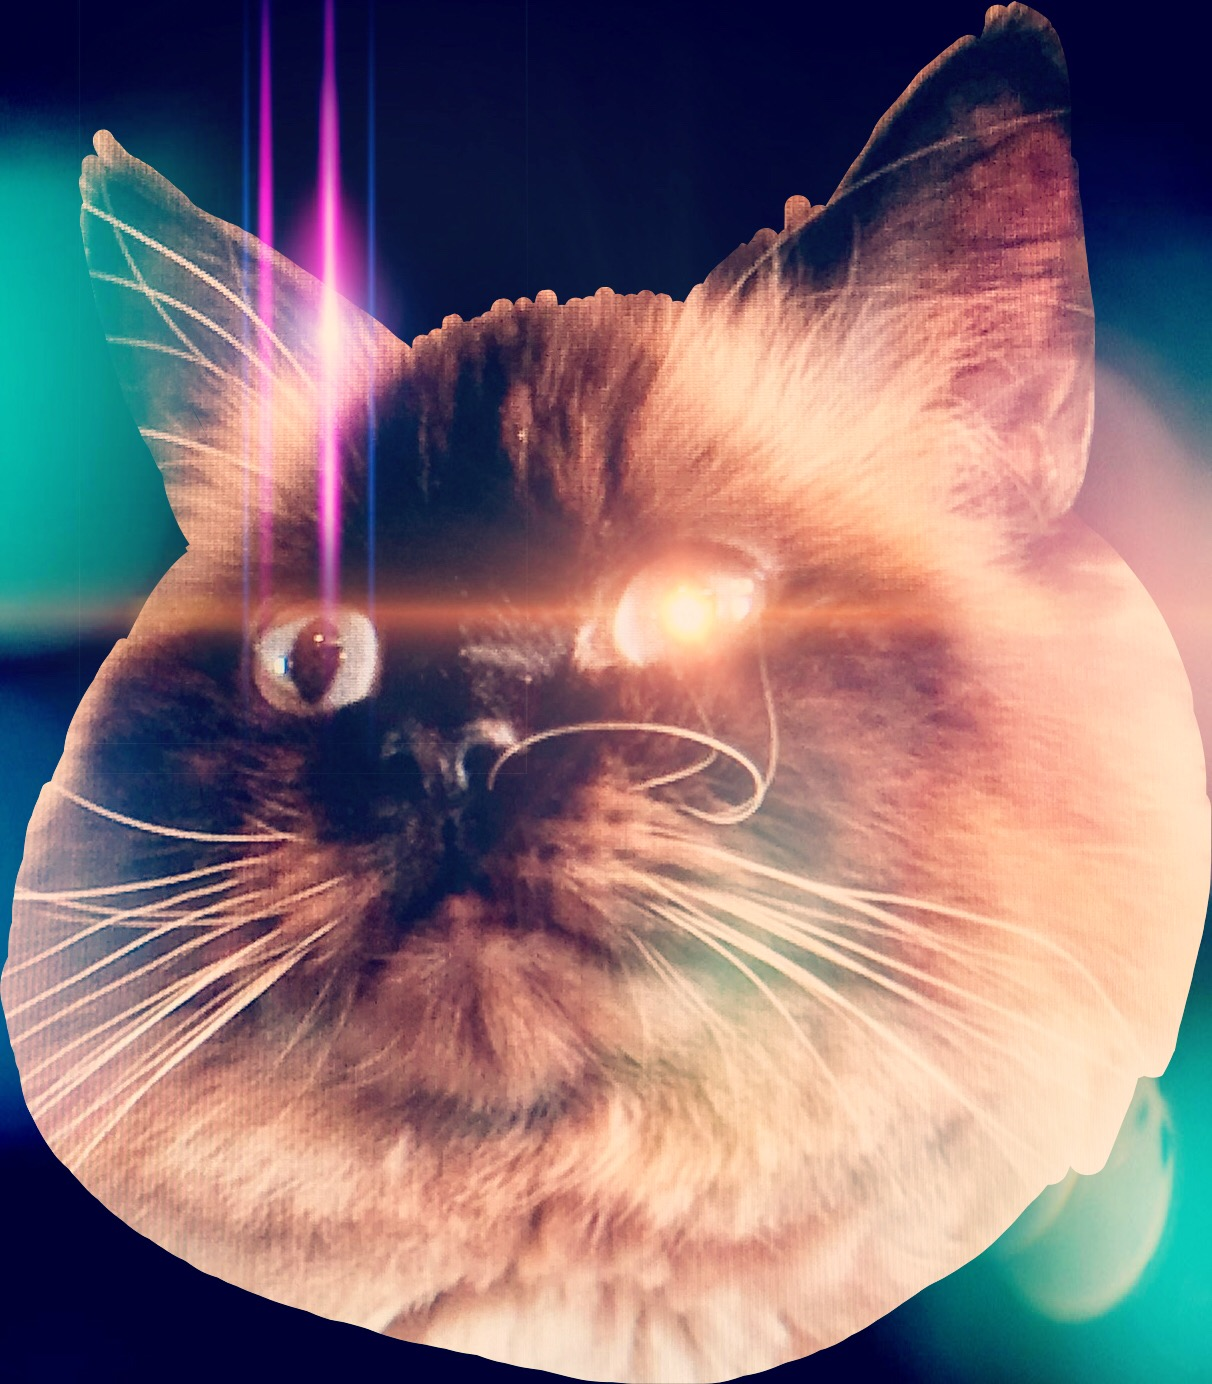 #lasereyes #galaxycat #cathead